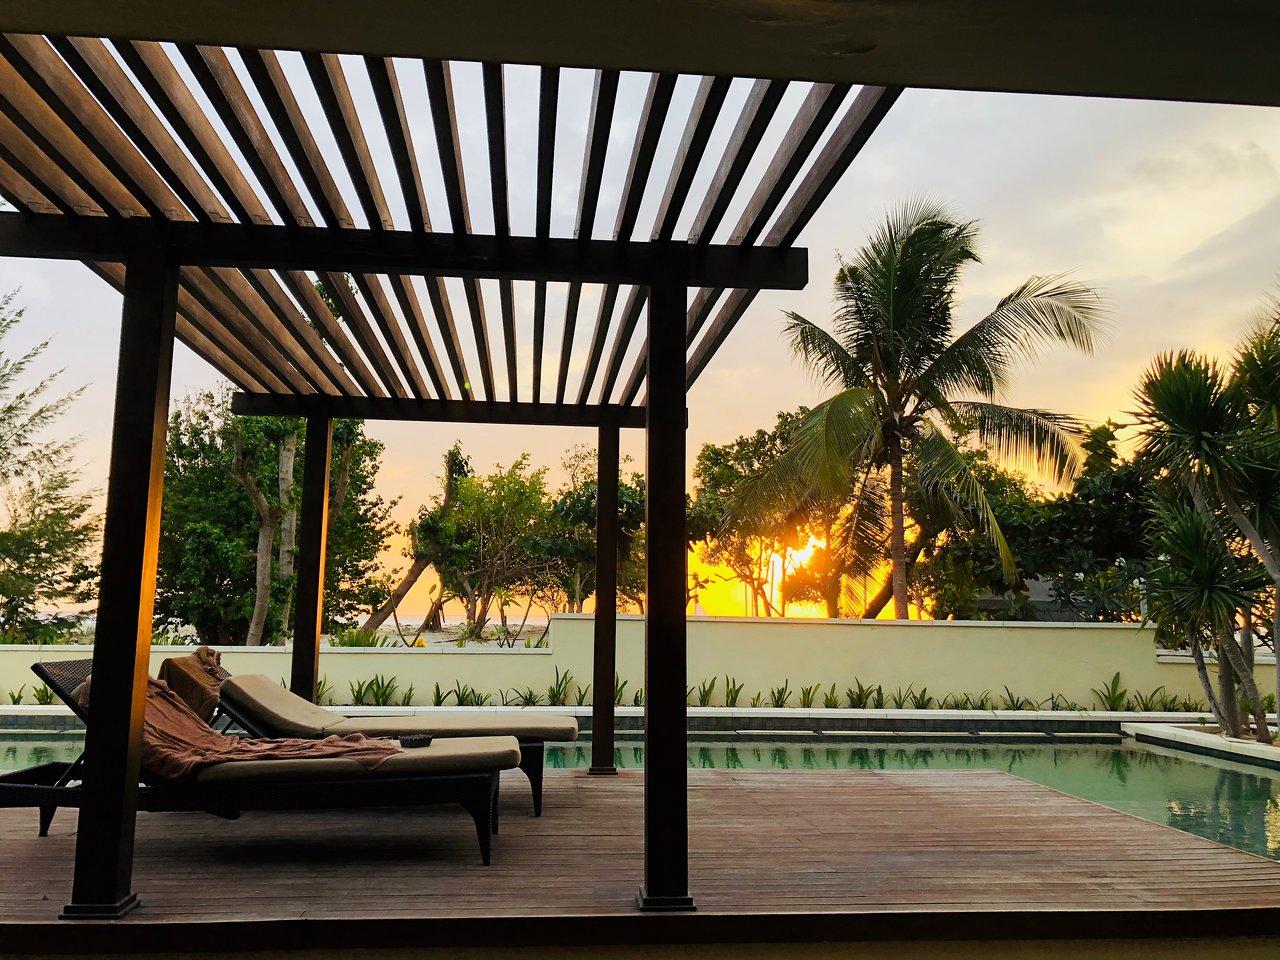 mala garden resort spa 43 1 2 3 updated 2019 prices rh tripadvisor com